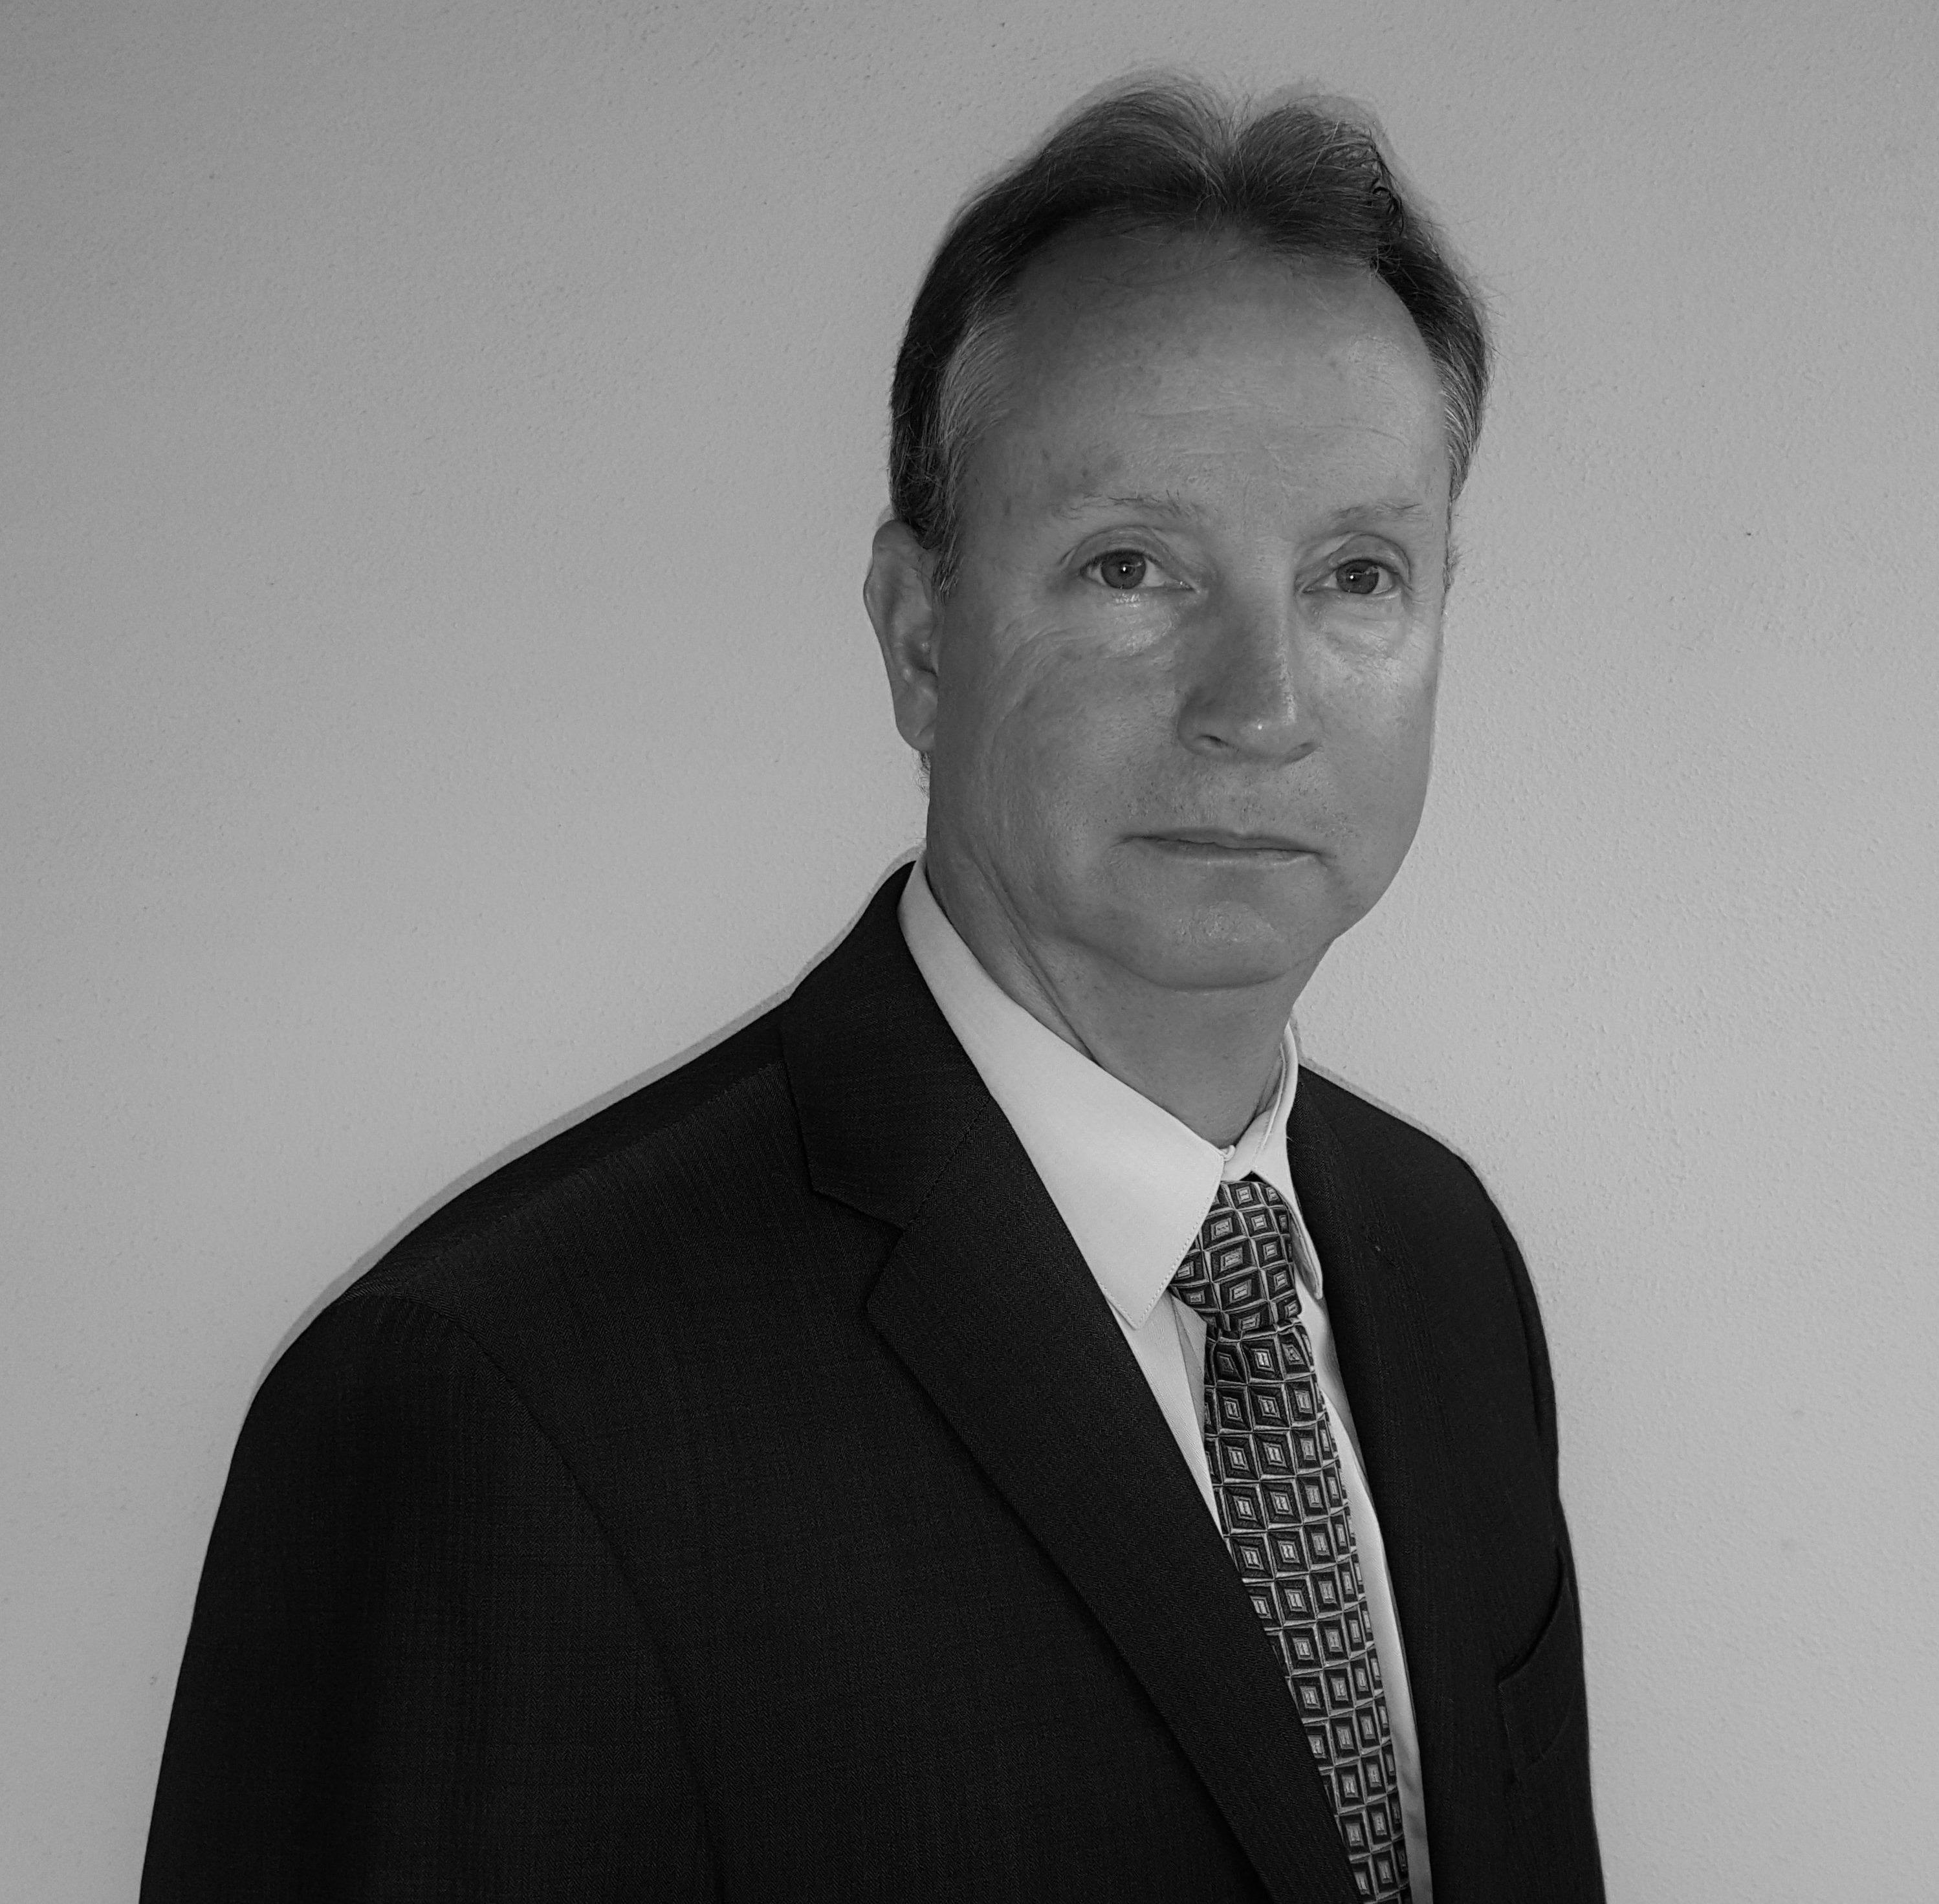 Gerard Quinlan